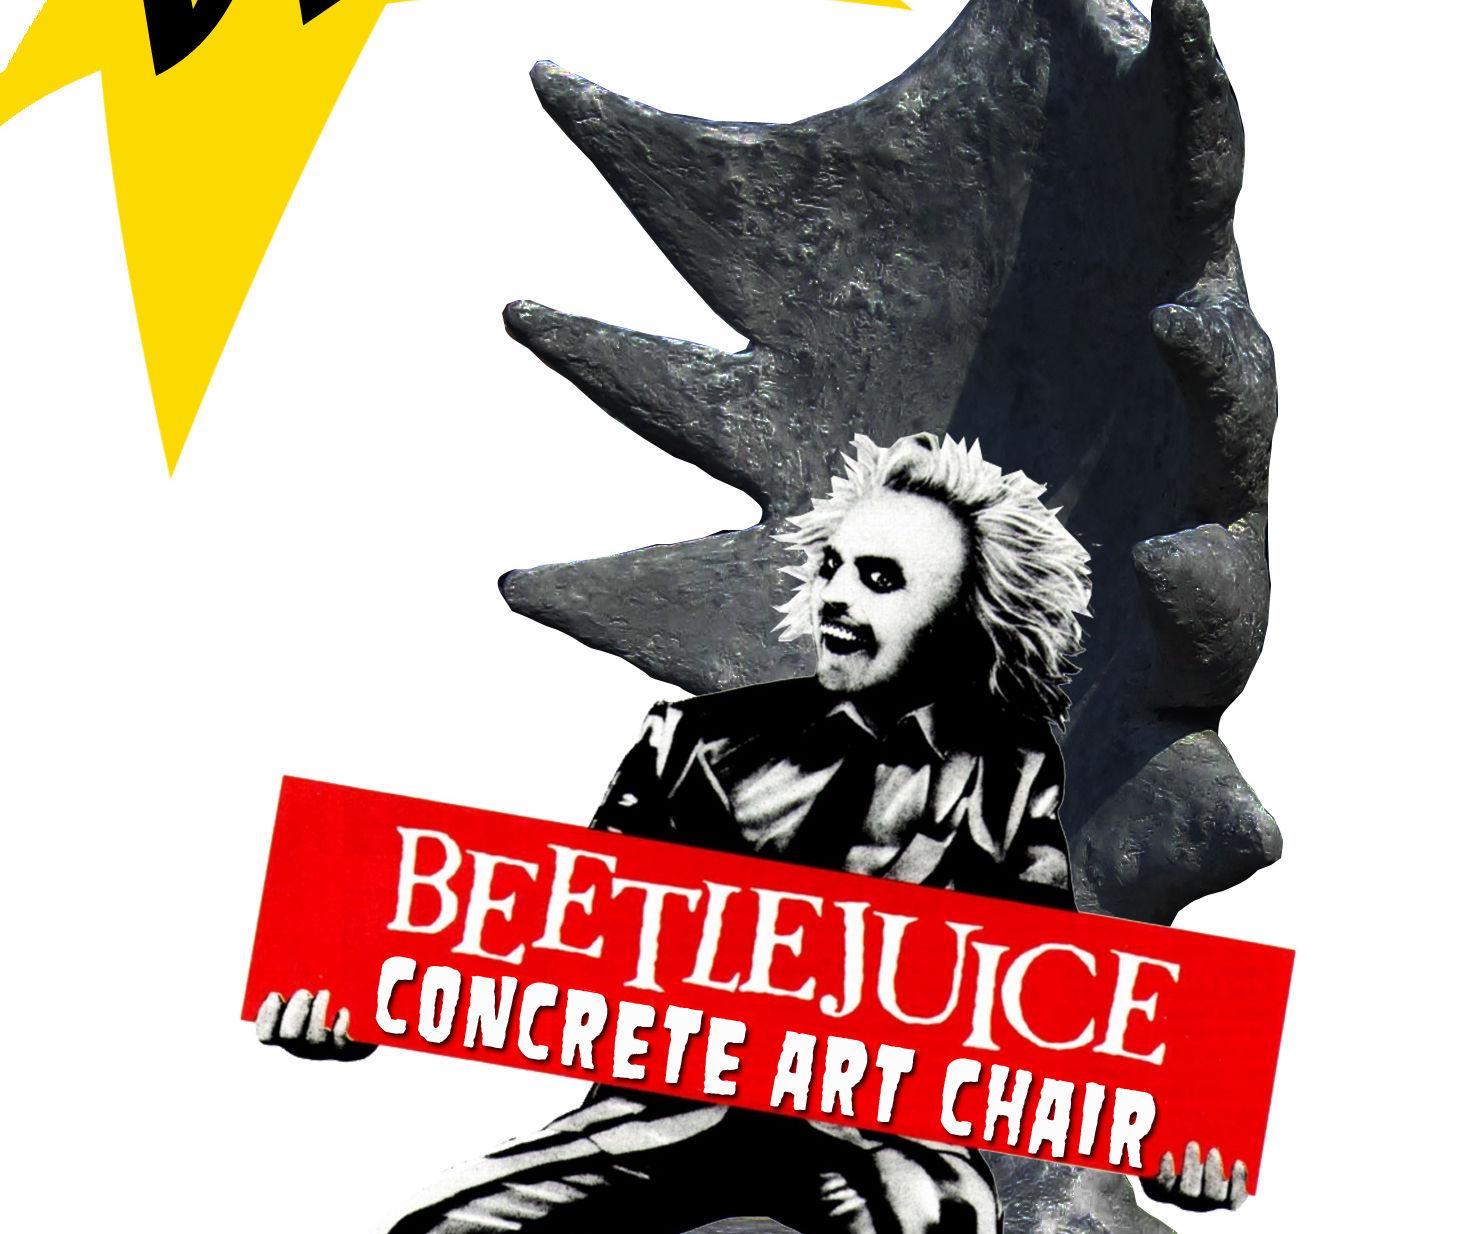 Beetlejuice Concrete Art Chair